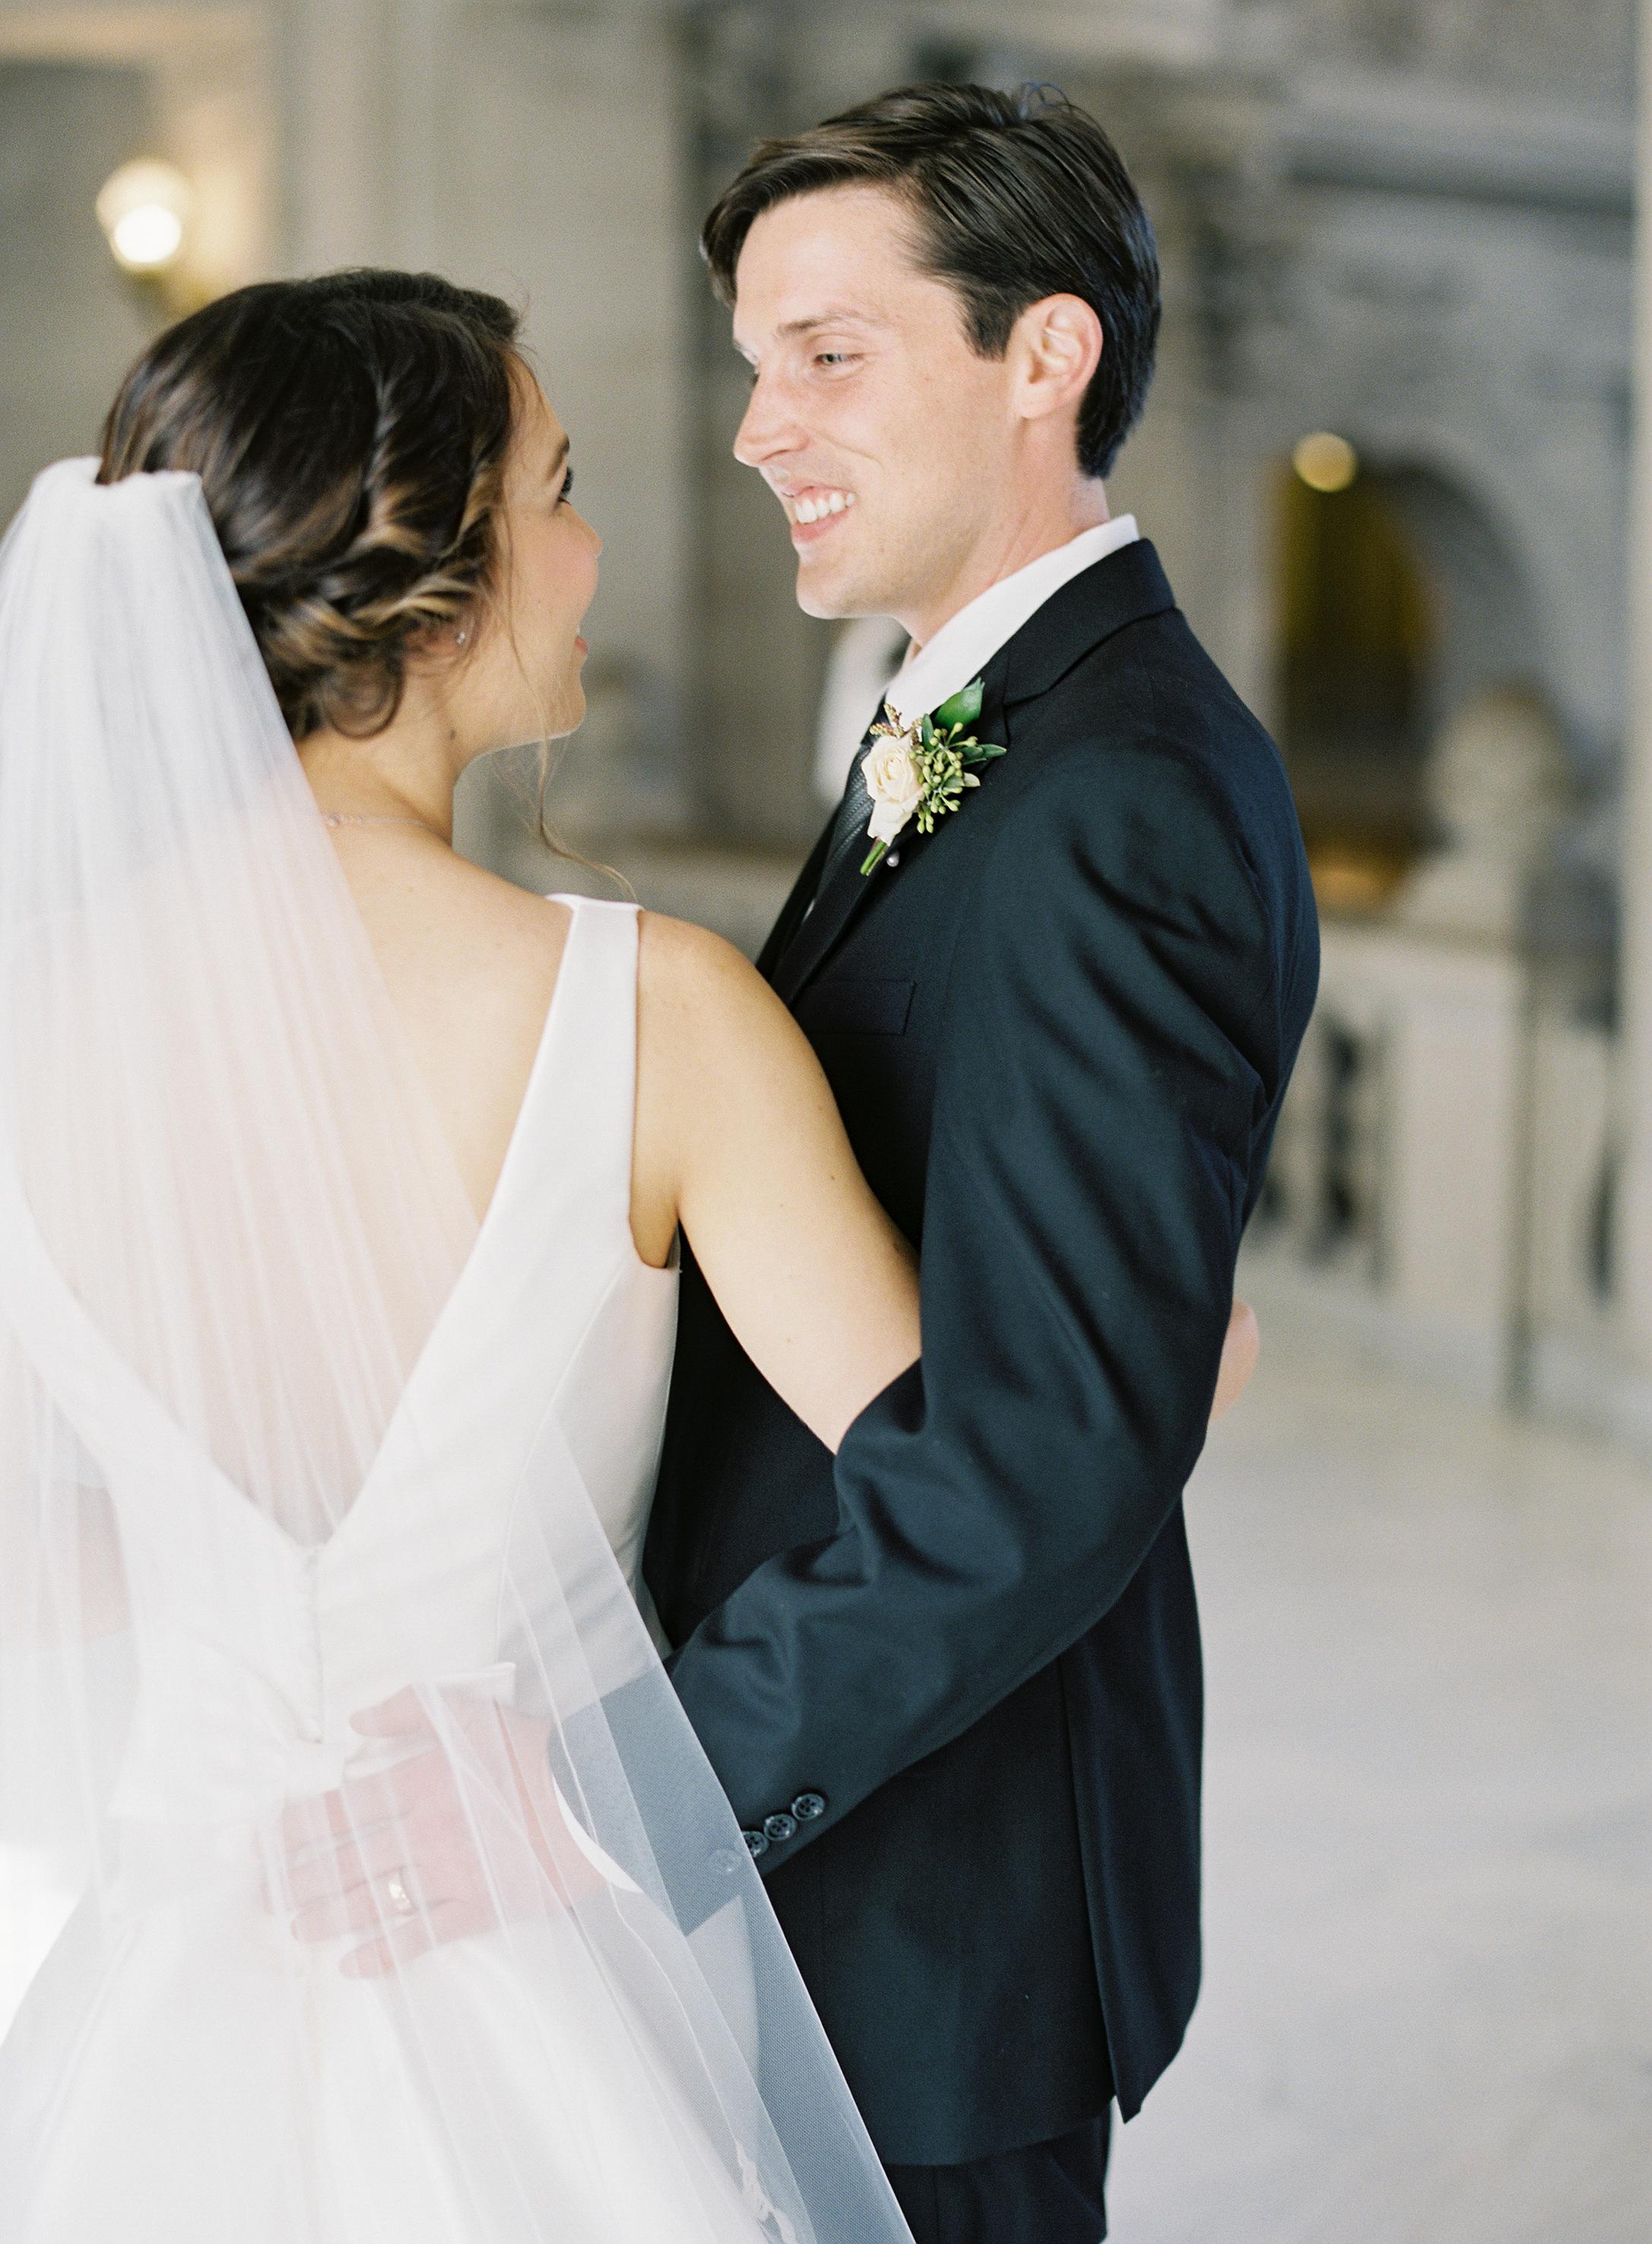 Meghan Mehan Photography - California Wedding Photographer | San Francisco City Hall Wedding 019.jpg